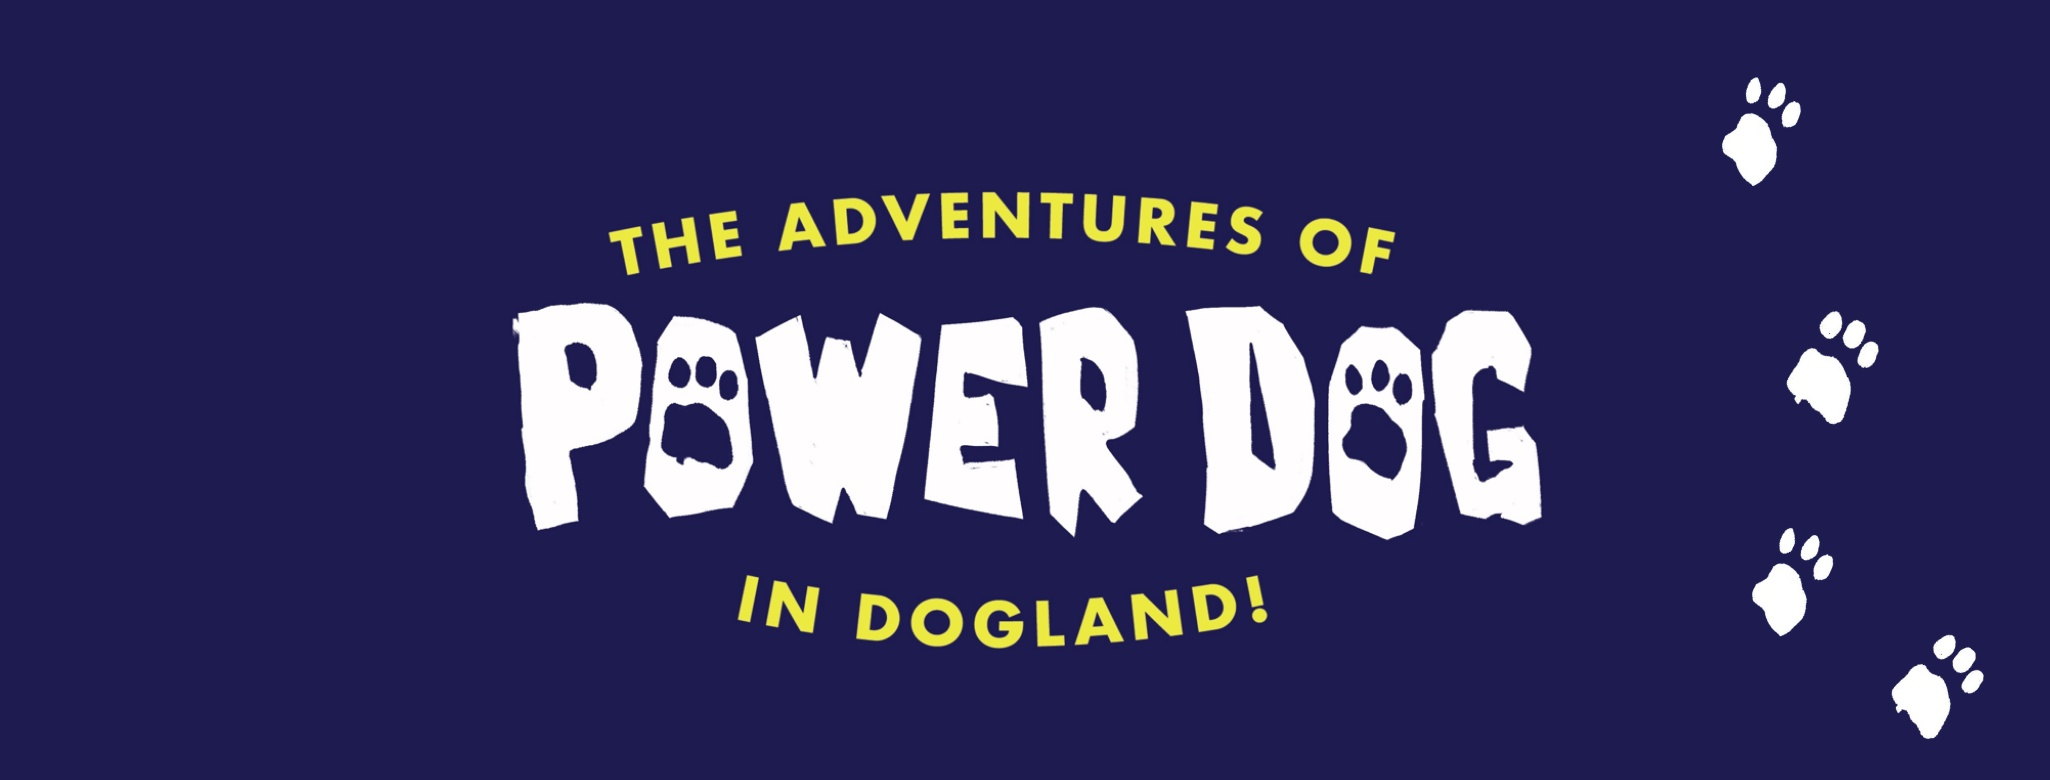 powerdog Cover